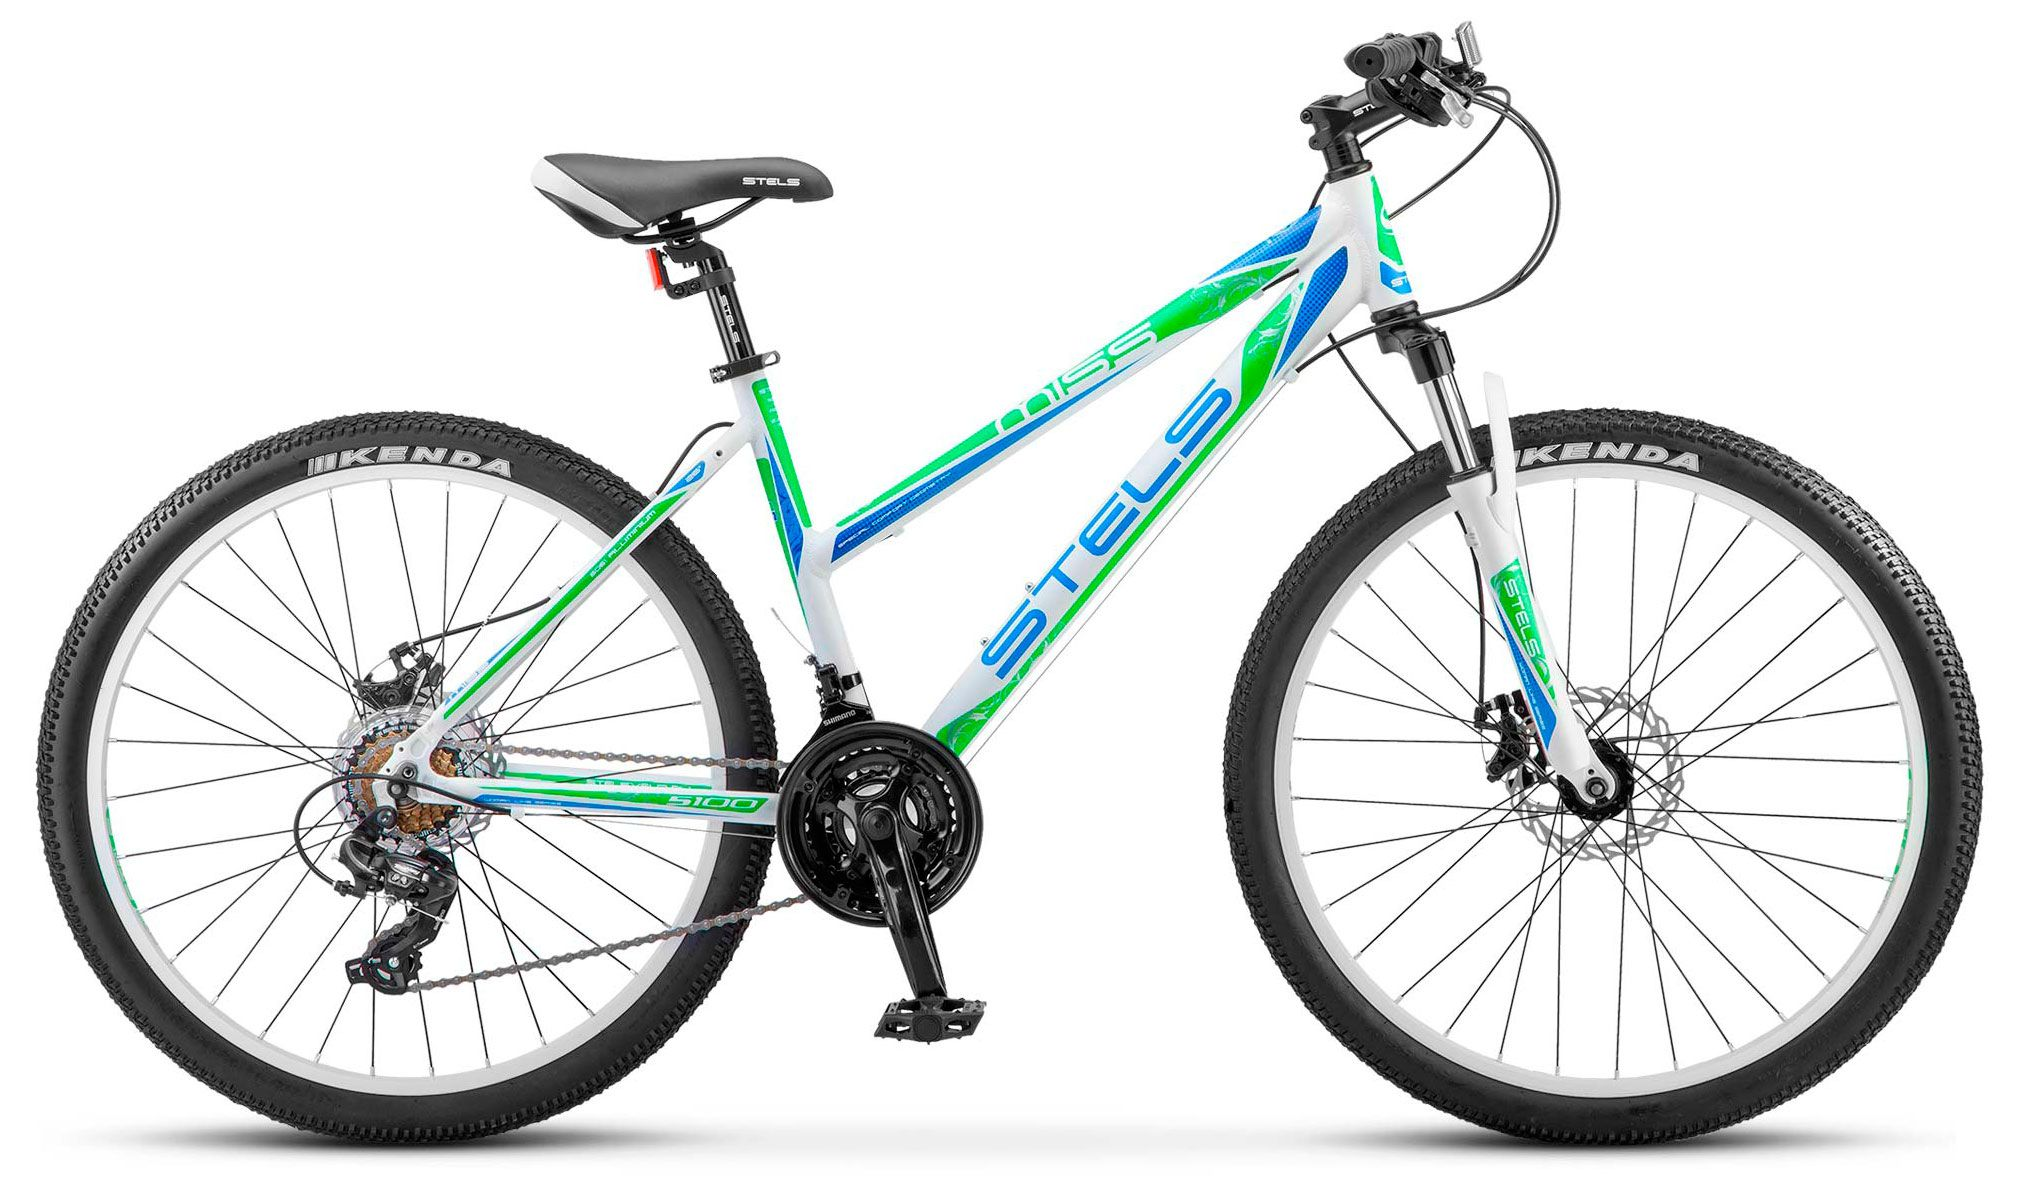 Велосипед Stels Miss 5100 MD 26 (V030) 2018 велосипед stels miss 5100 md 26 2017